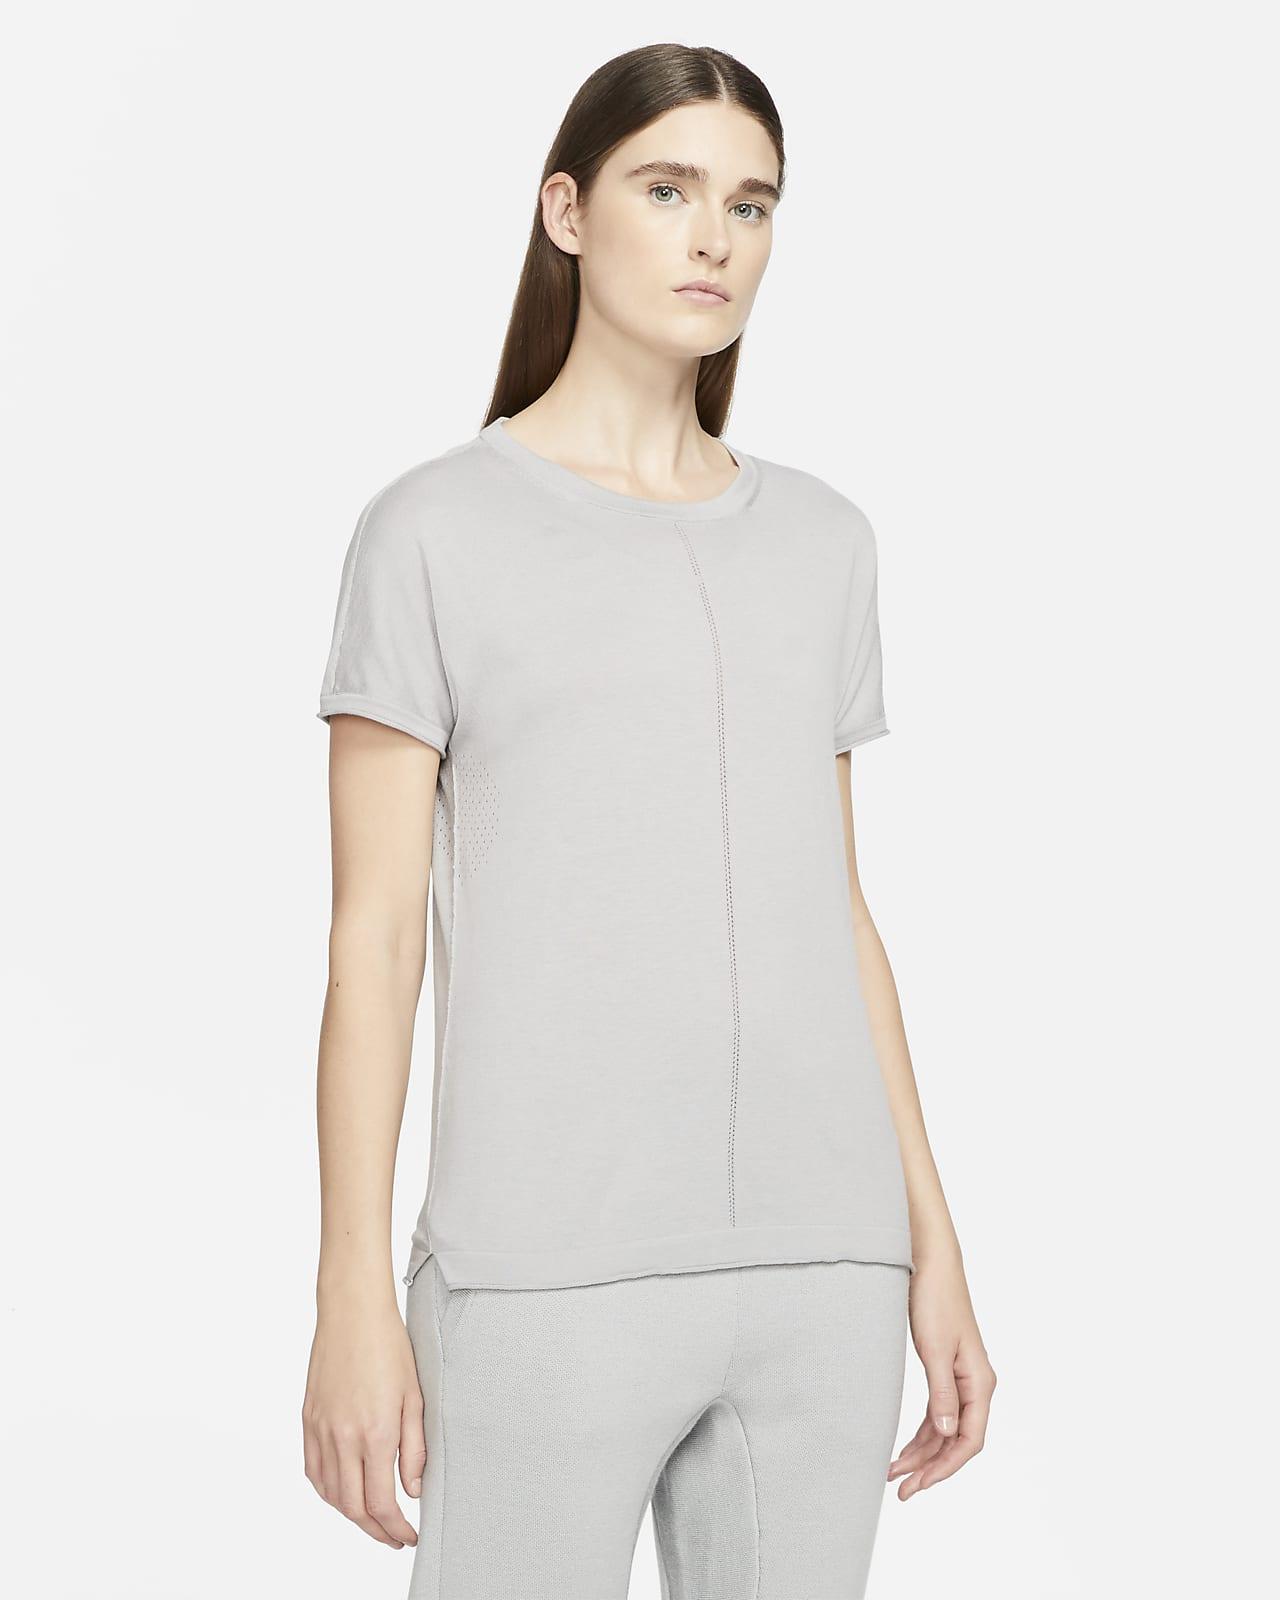 Nike ESC Strick-Kurzarmoberteil für Damen